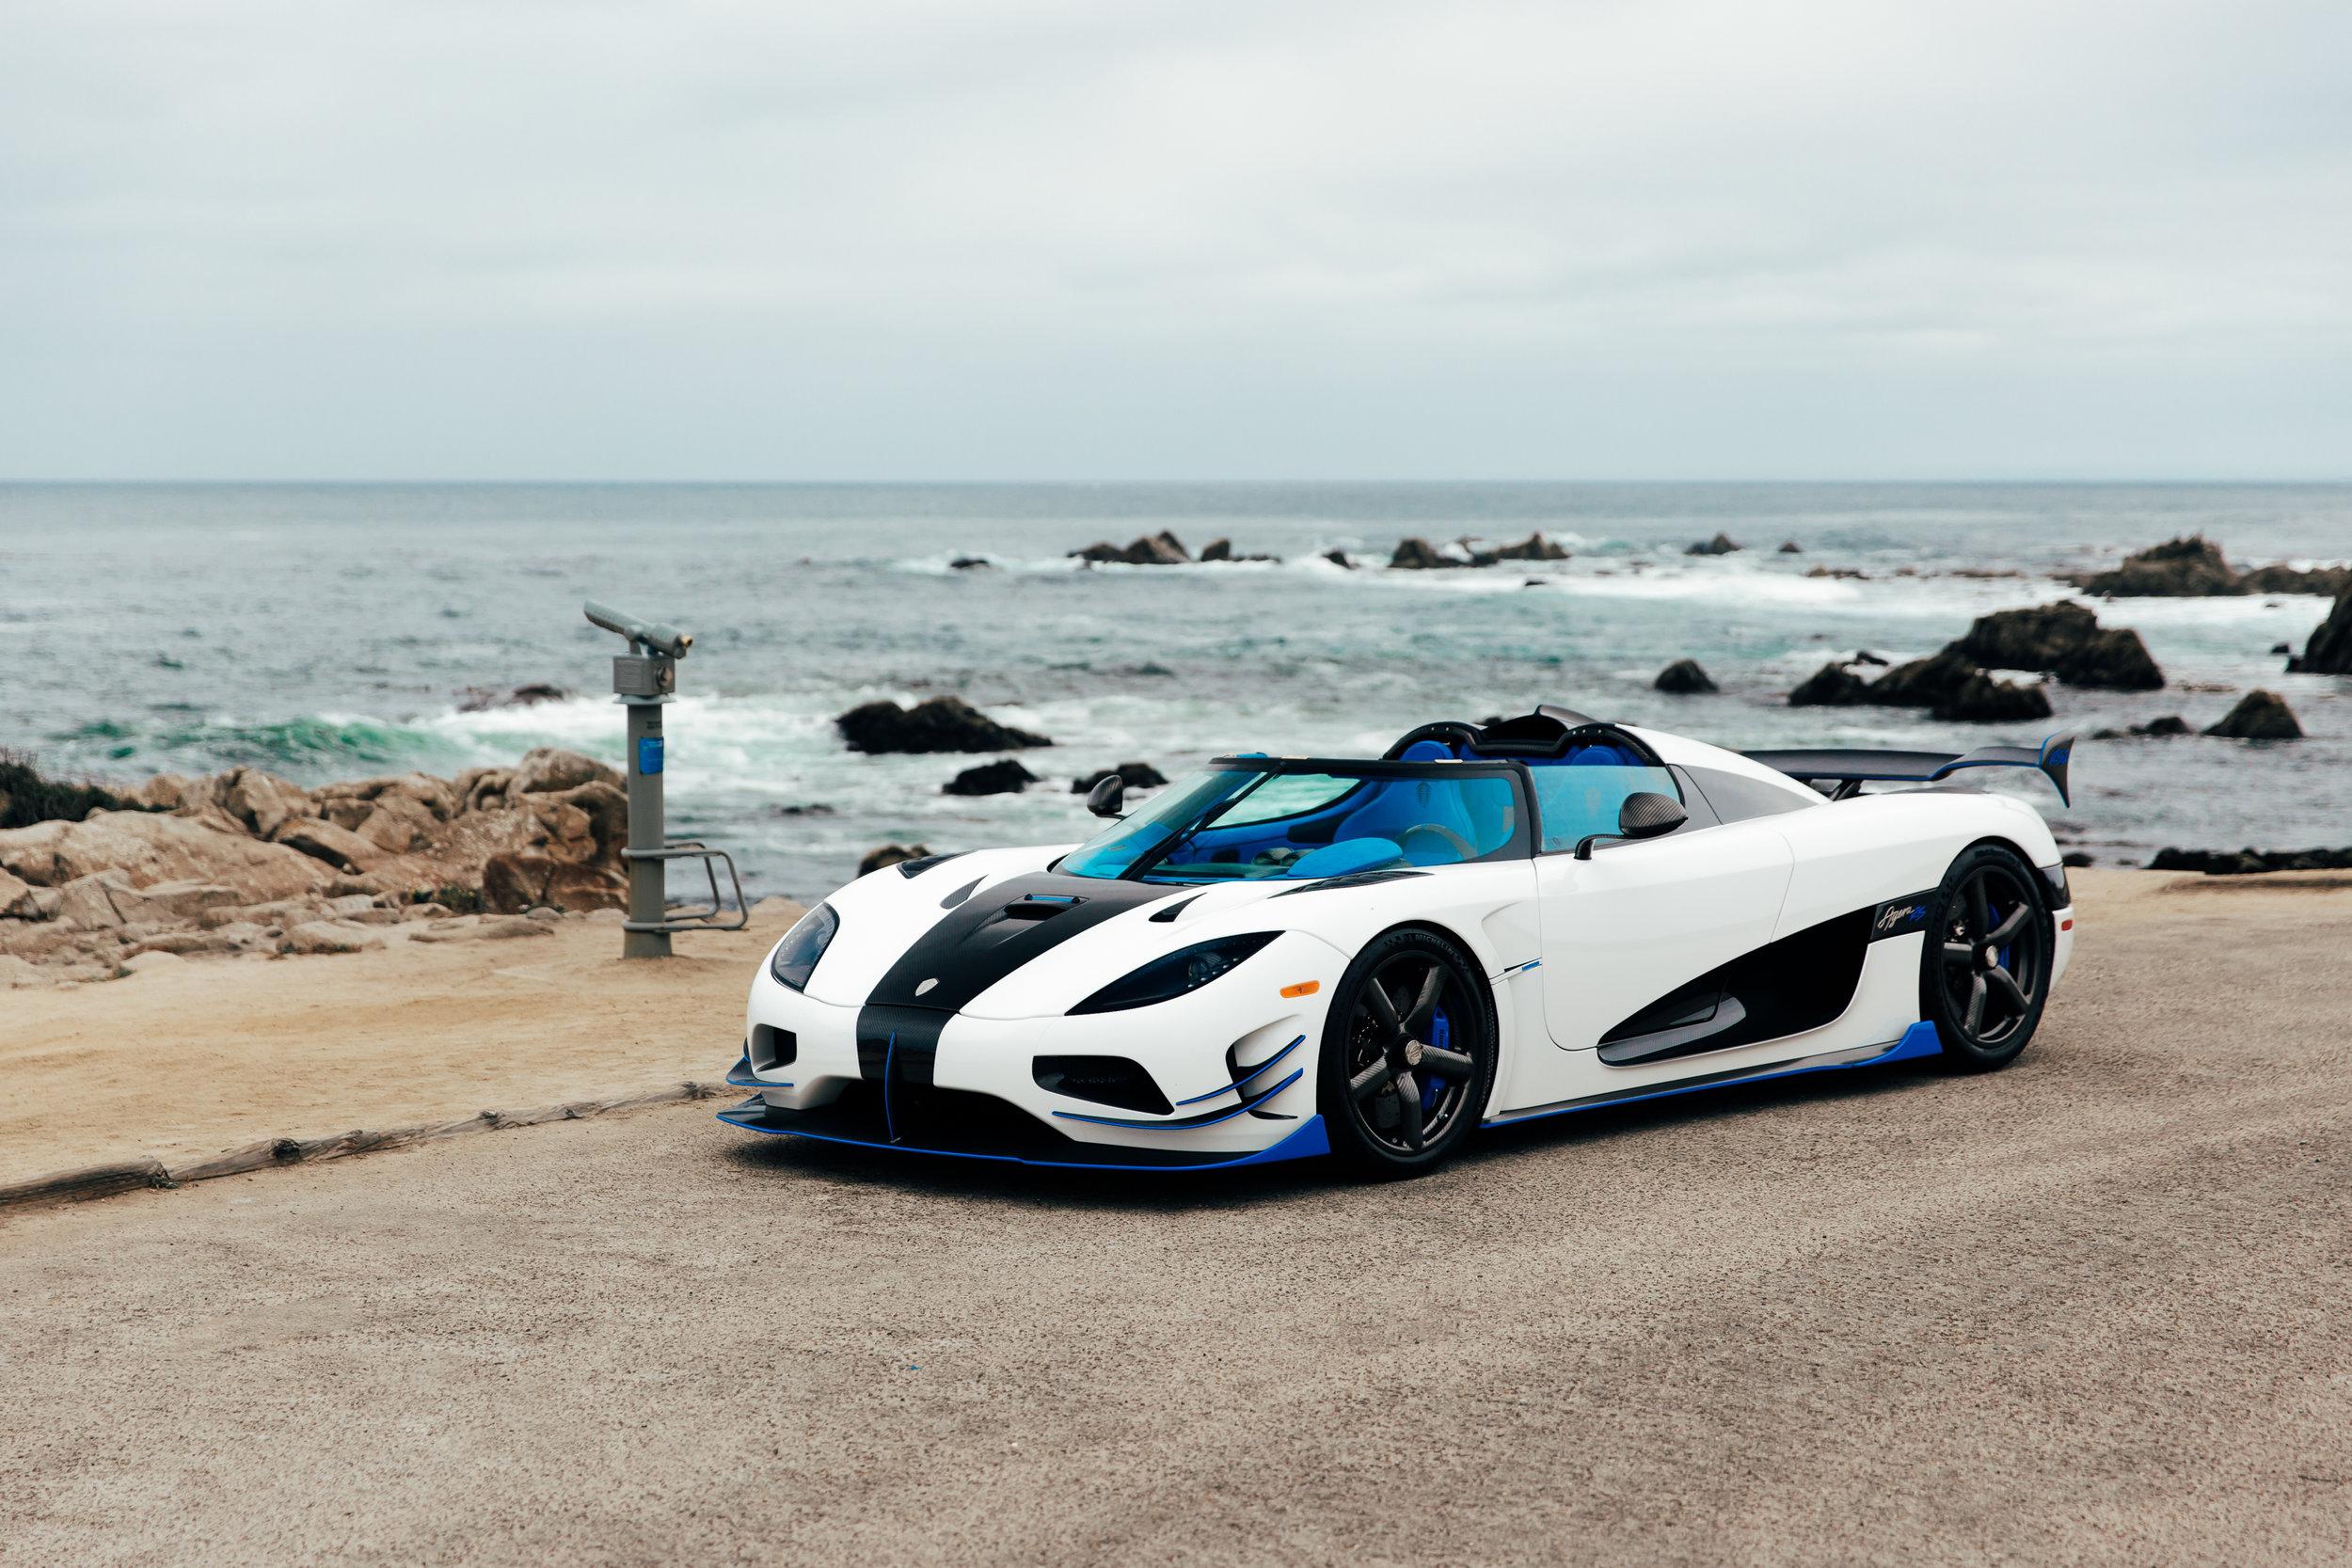 Stay_Driven_Monterey_Car_Week_Whitesse_Koenigsegg-23.jpg